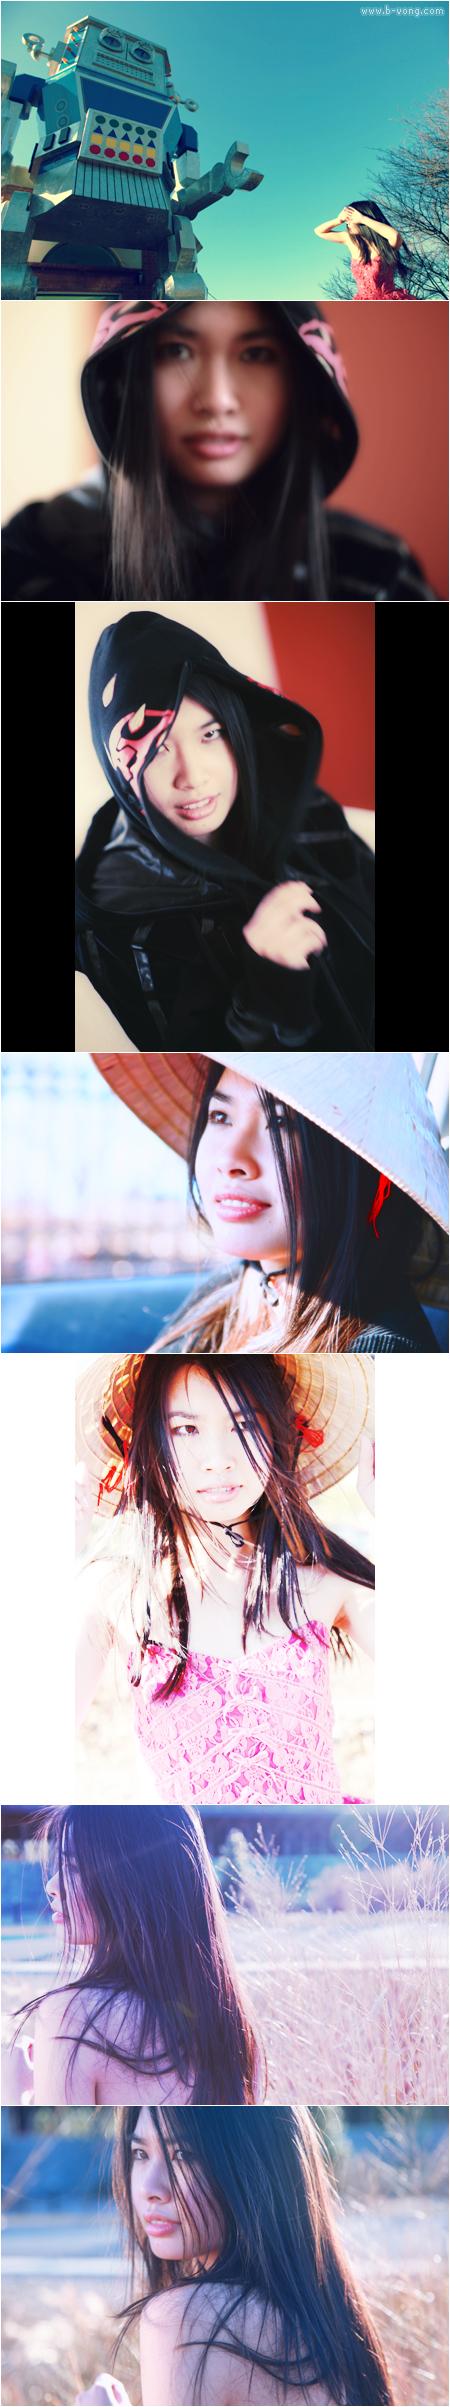 w_b-vong.com_pix_misa_2